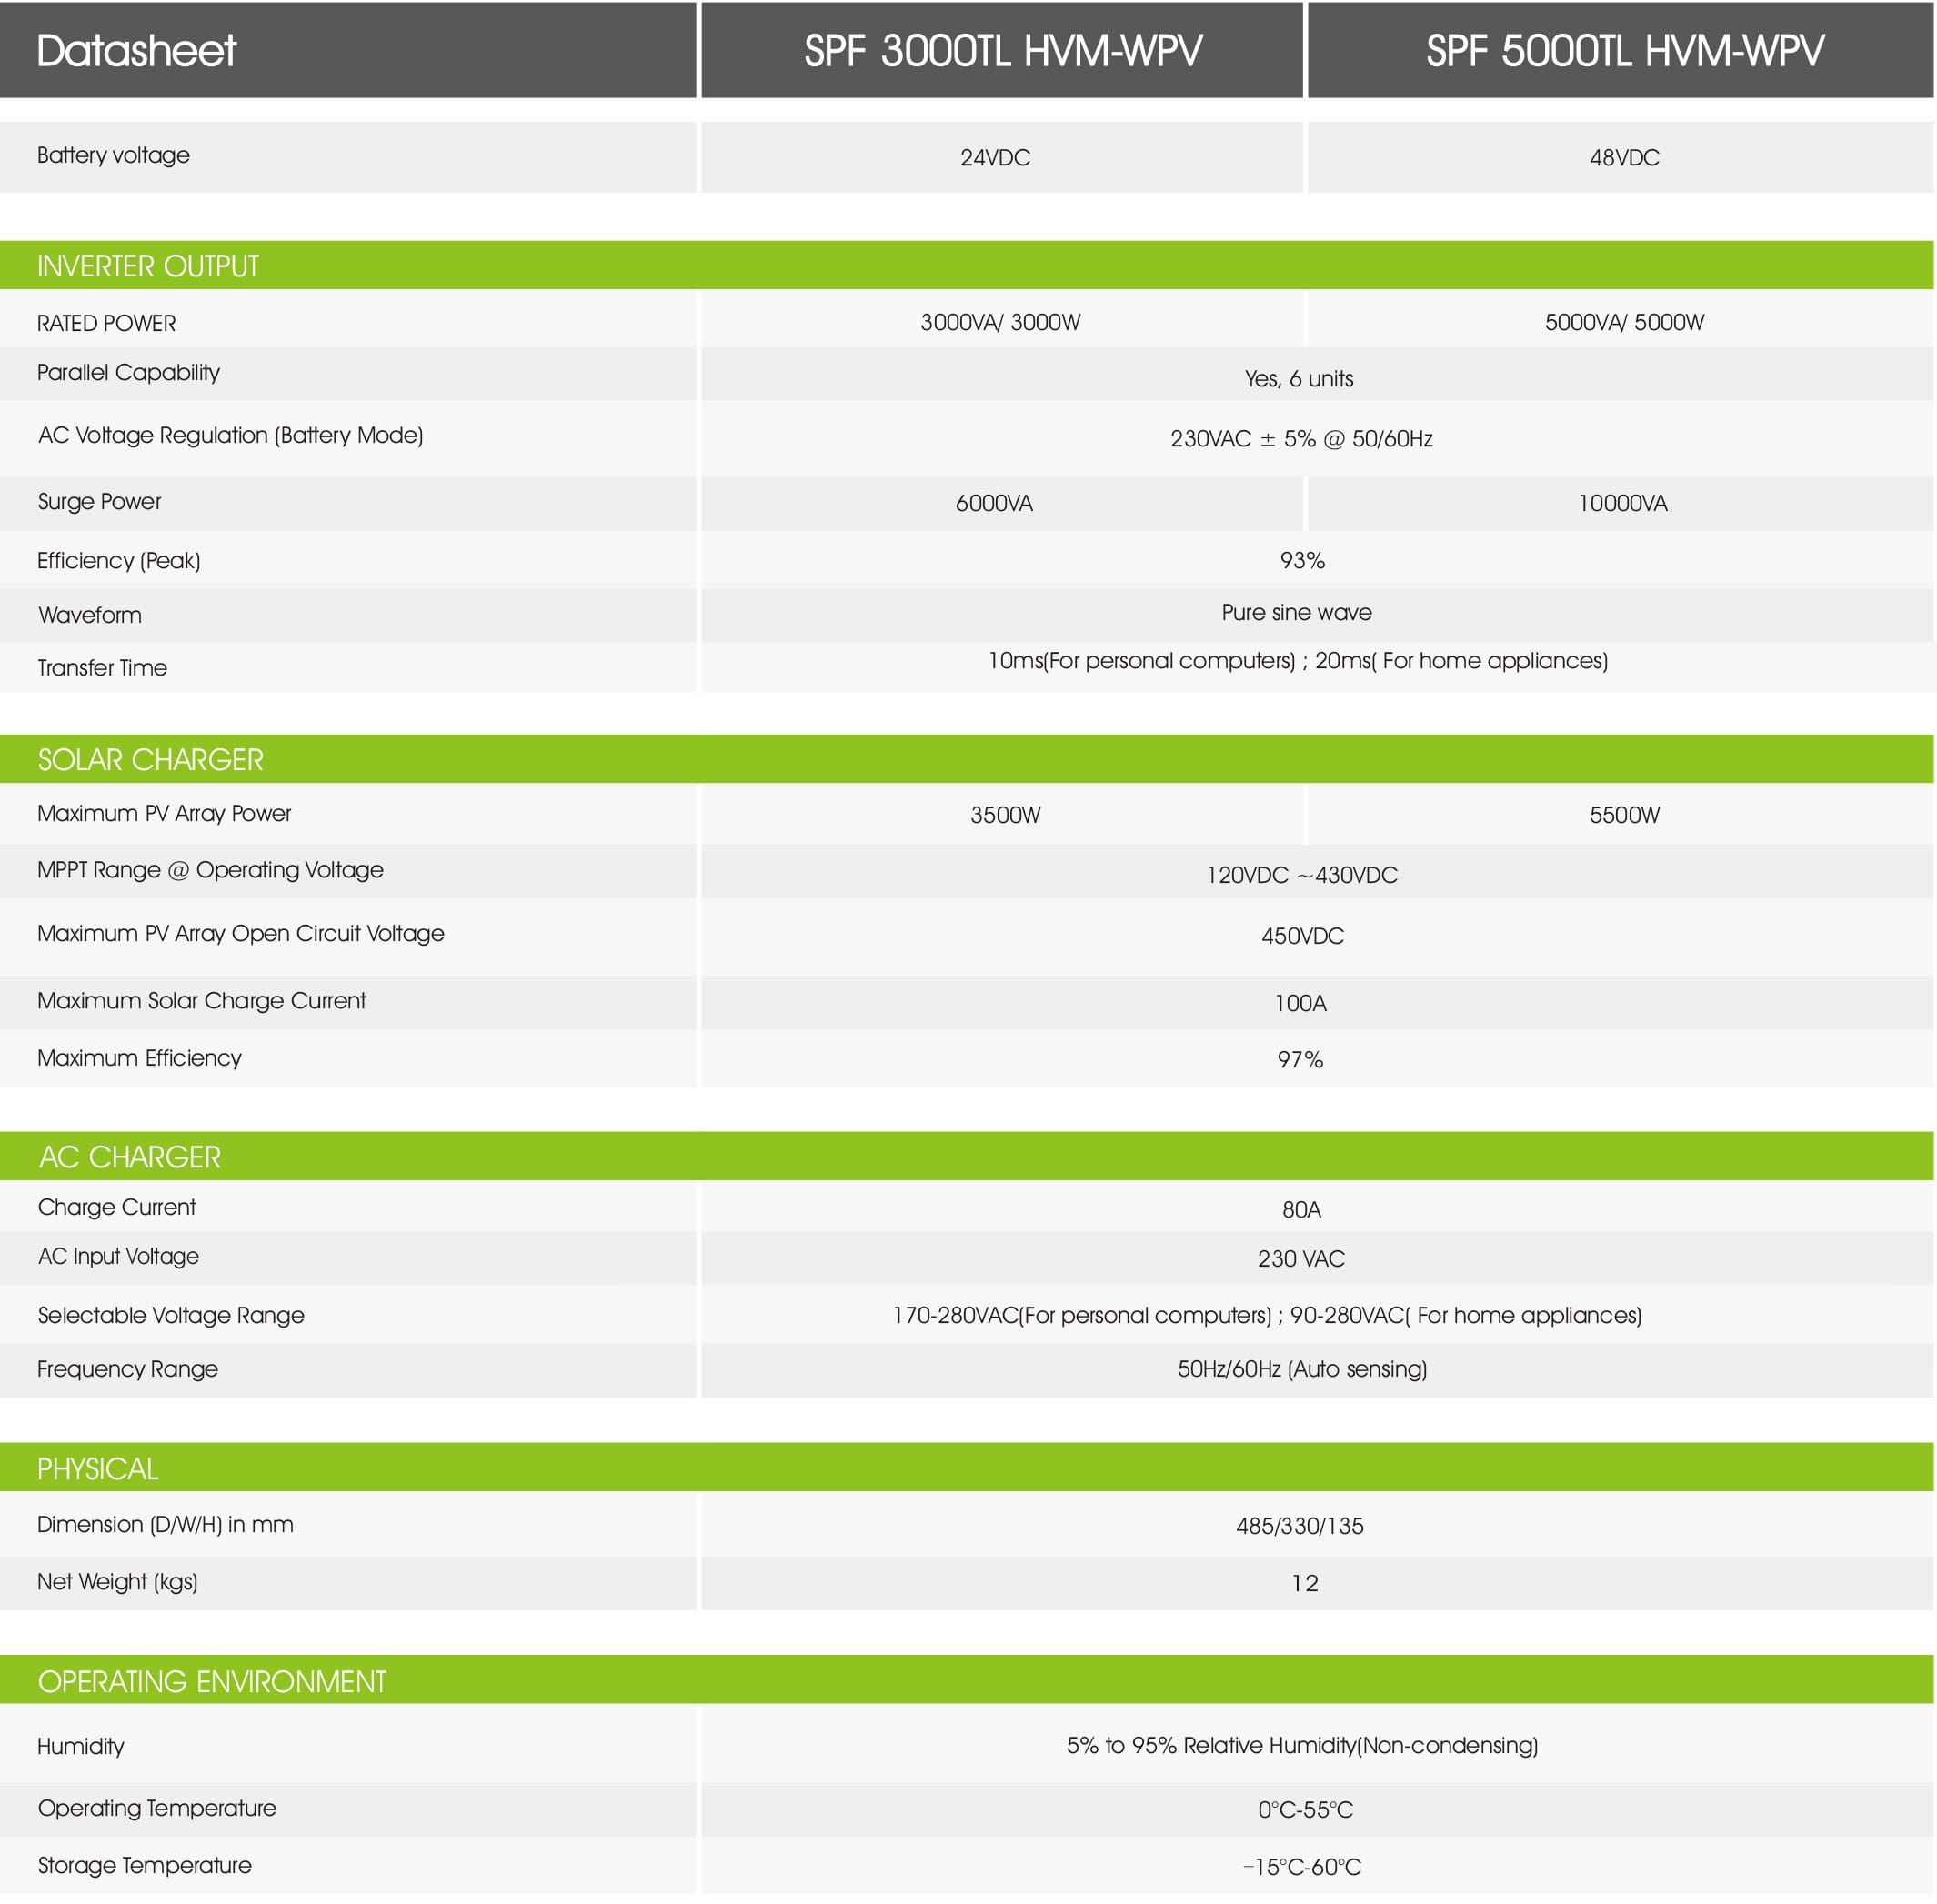 Growatt Spf 3000-5000Tl Hvm-Wpv PDF | Sernolux.com